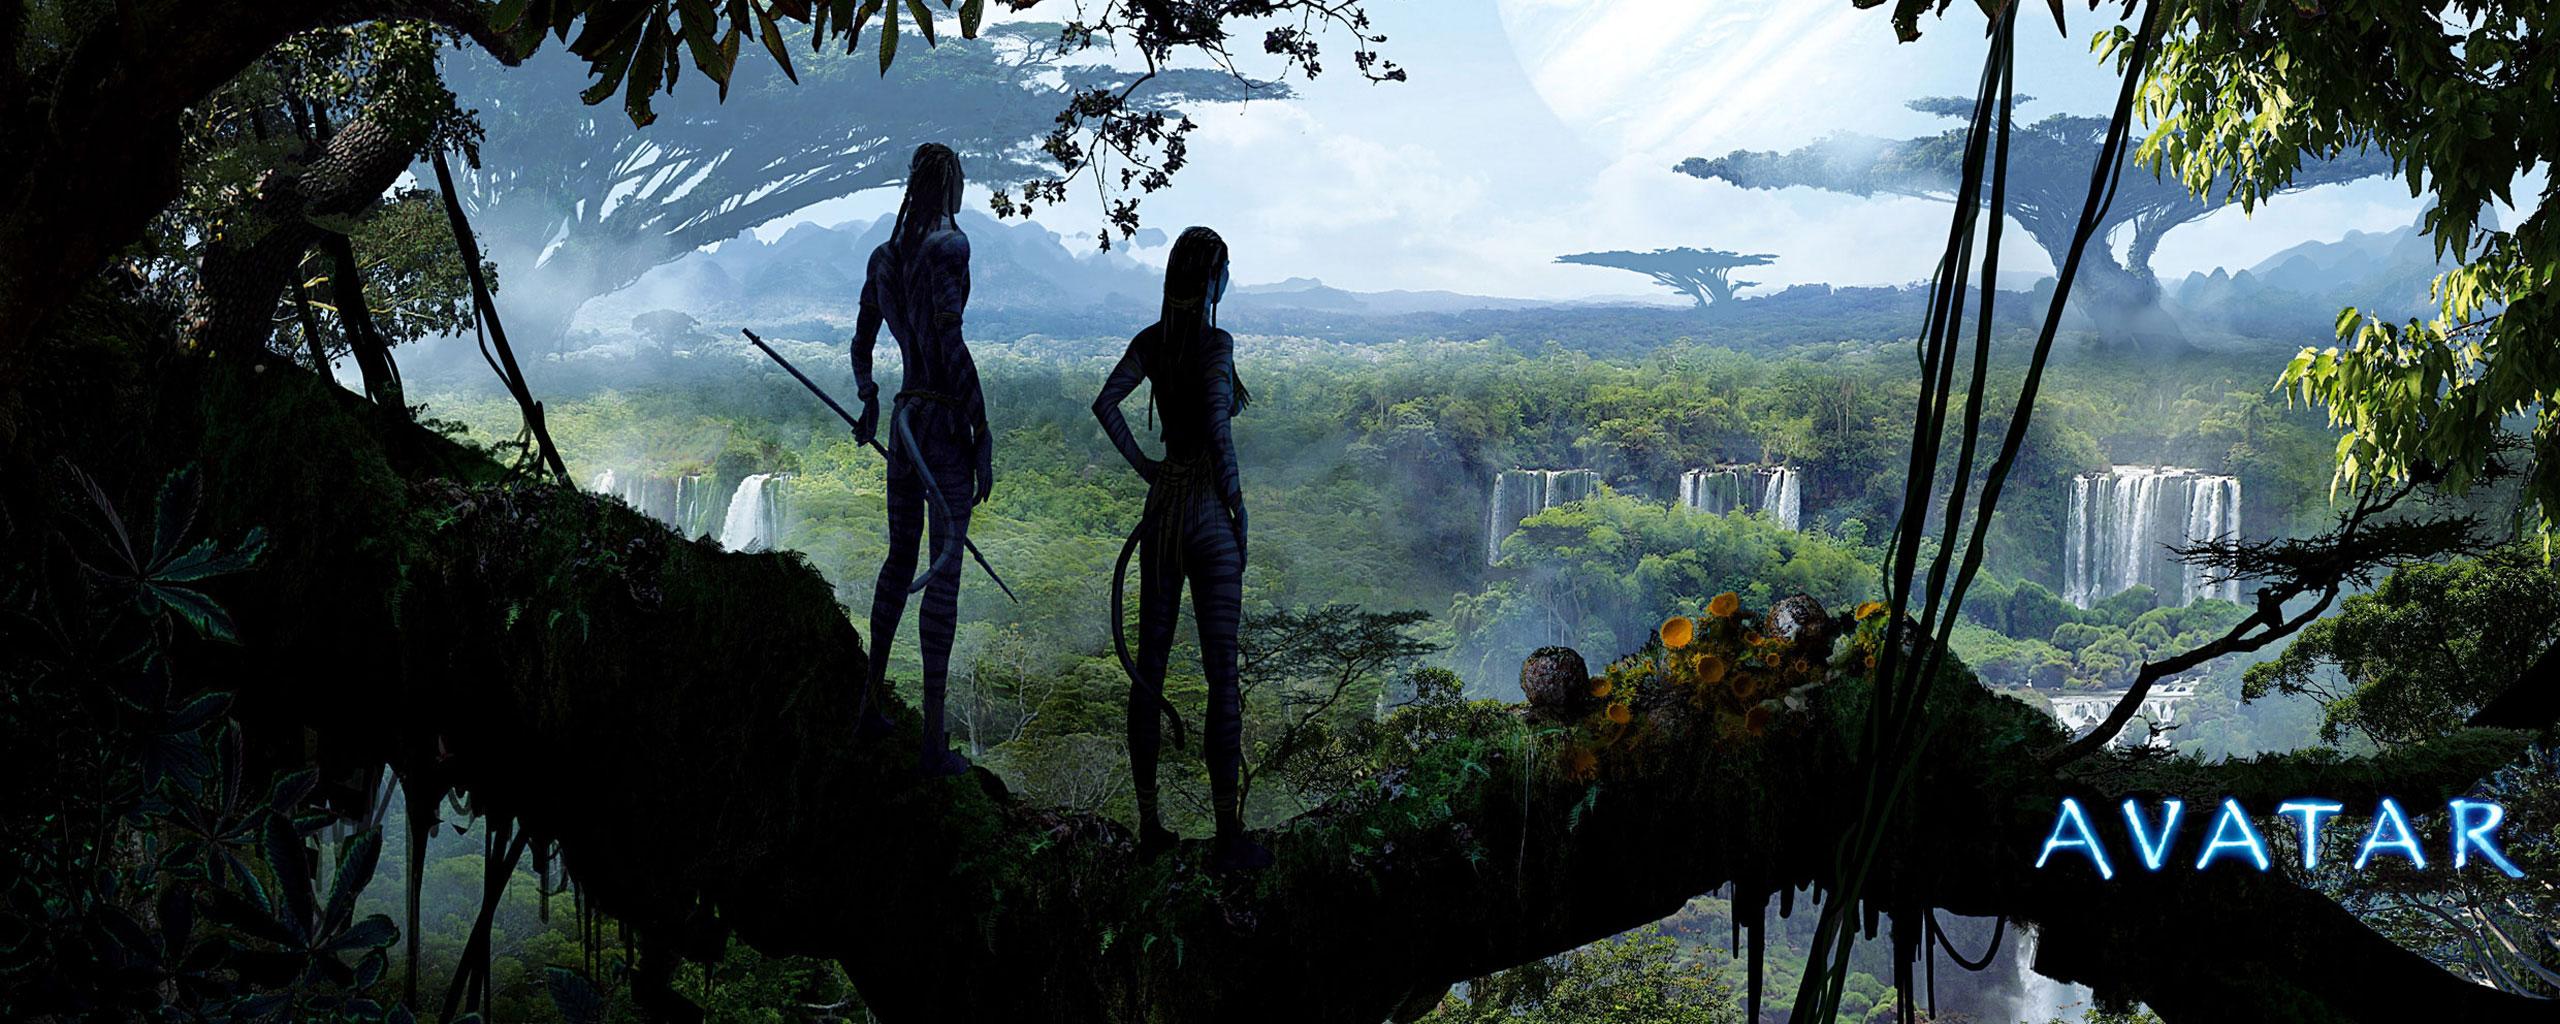 Wallpapers   Avatar Movie Dual Screen wallpaper 2560x1024